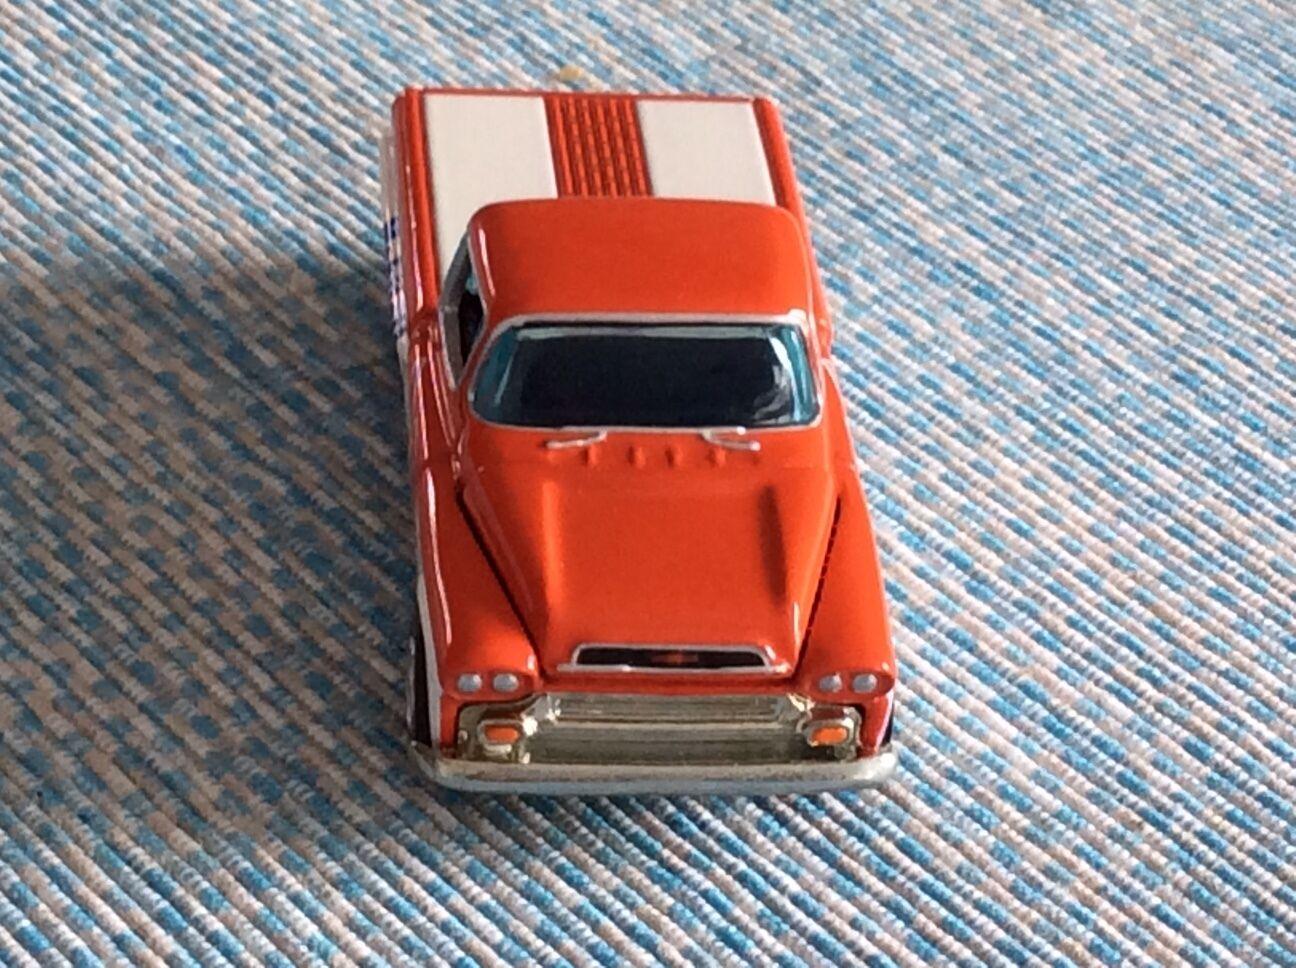 Hotwheels 1958 Chevy Apache-MOBIL OIL